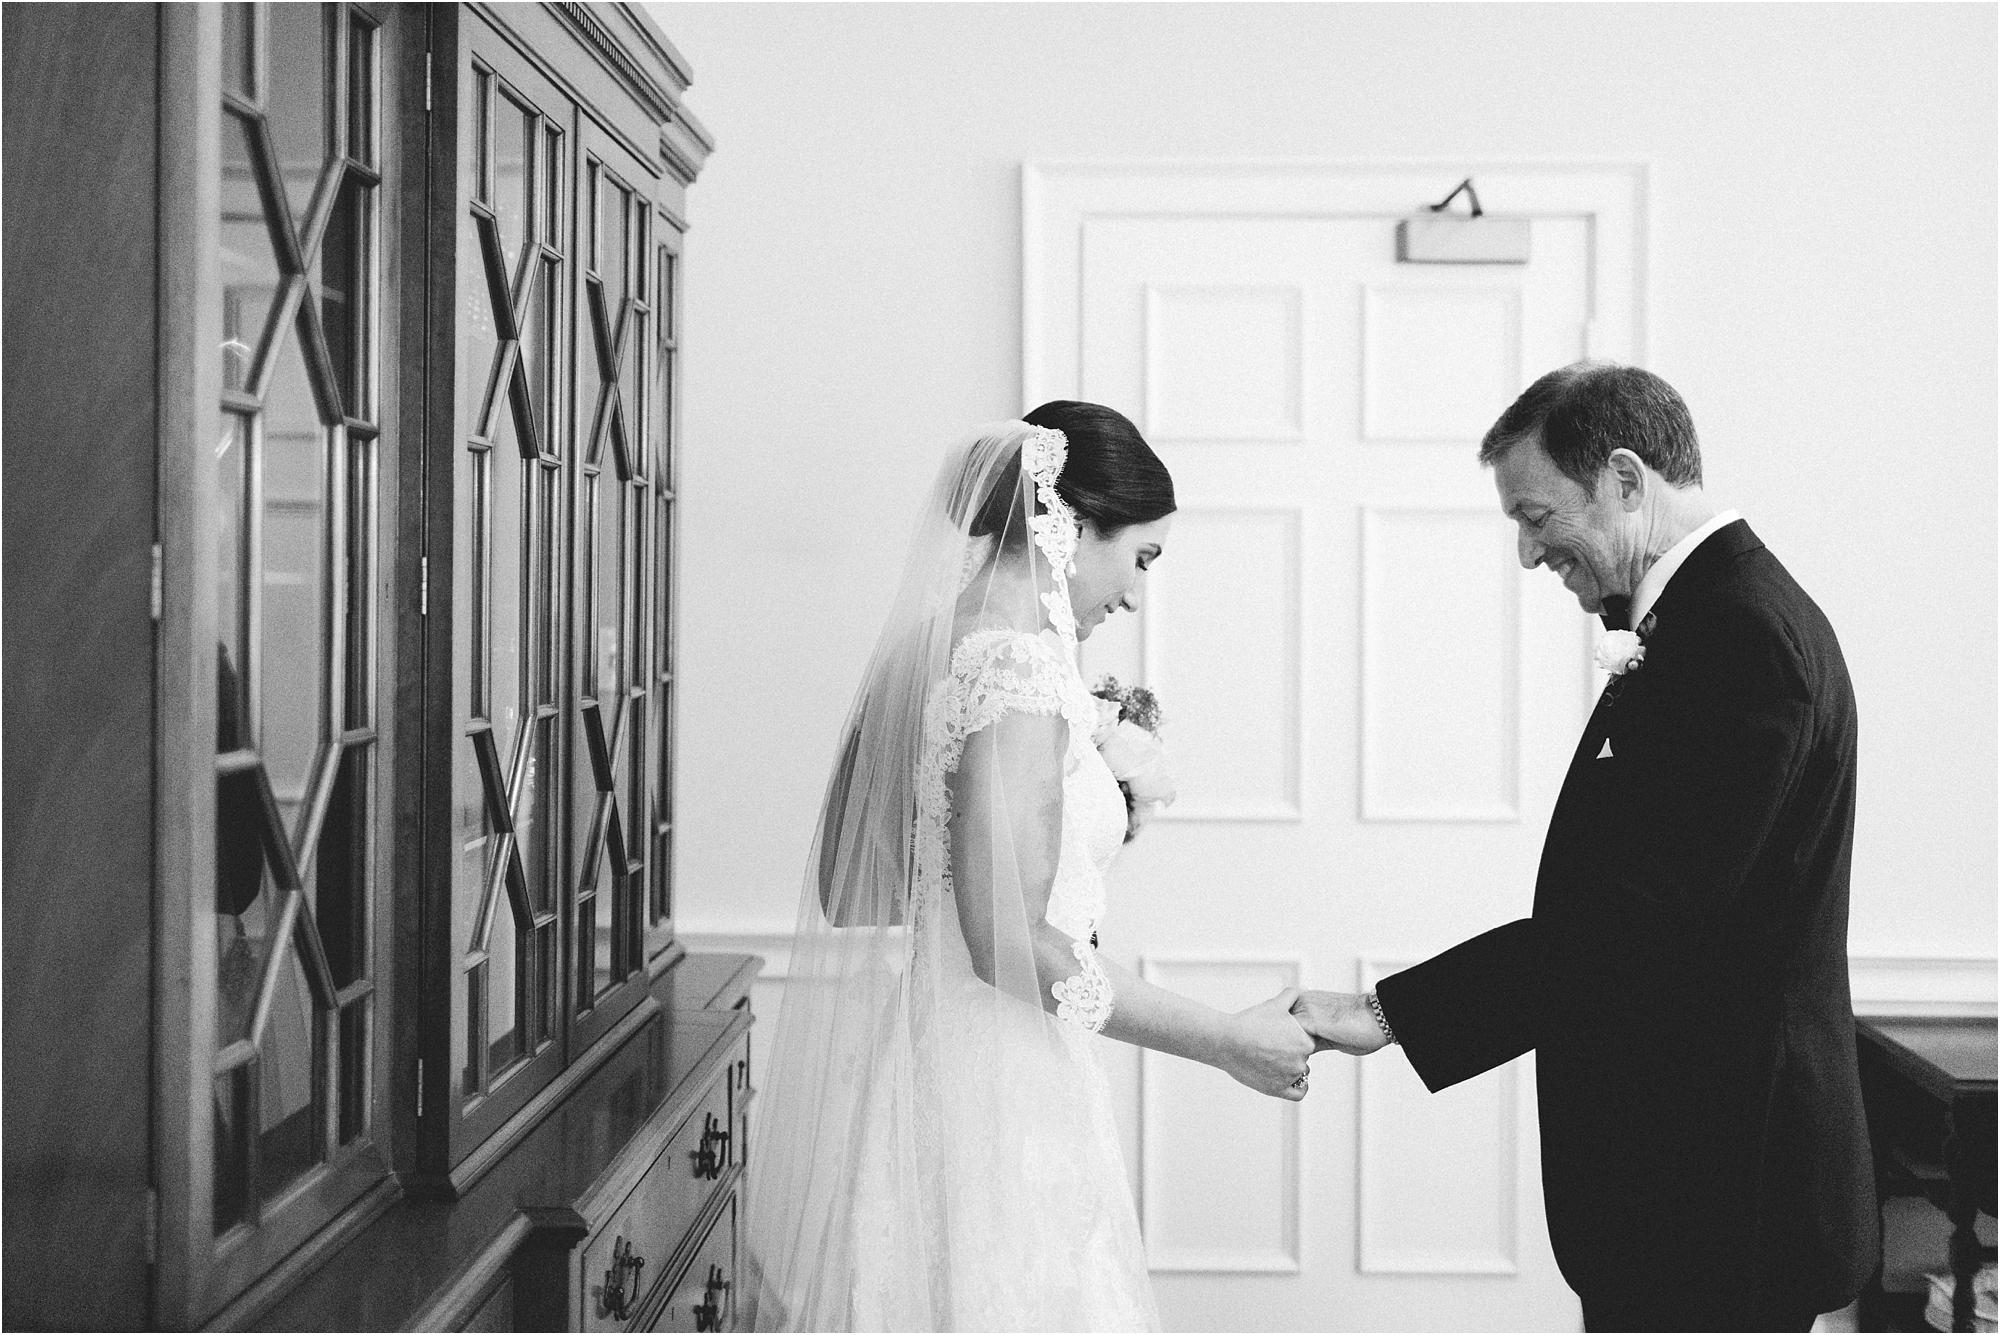 stephanie-yonce-photography-richmond-virginia-country-club-wedding-photo_022.JPG